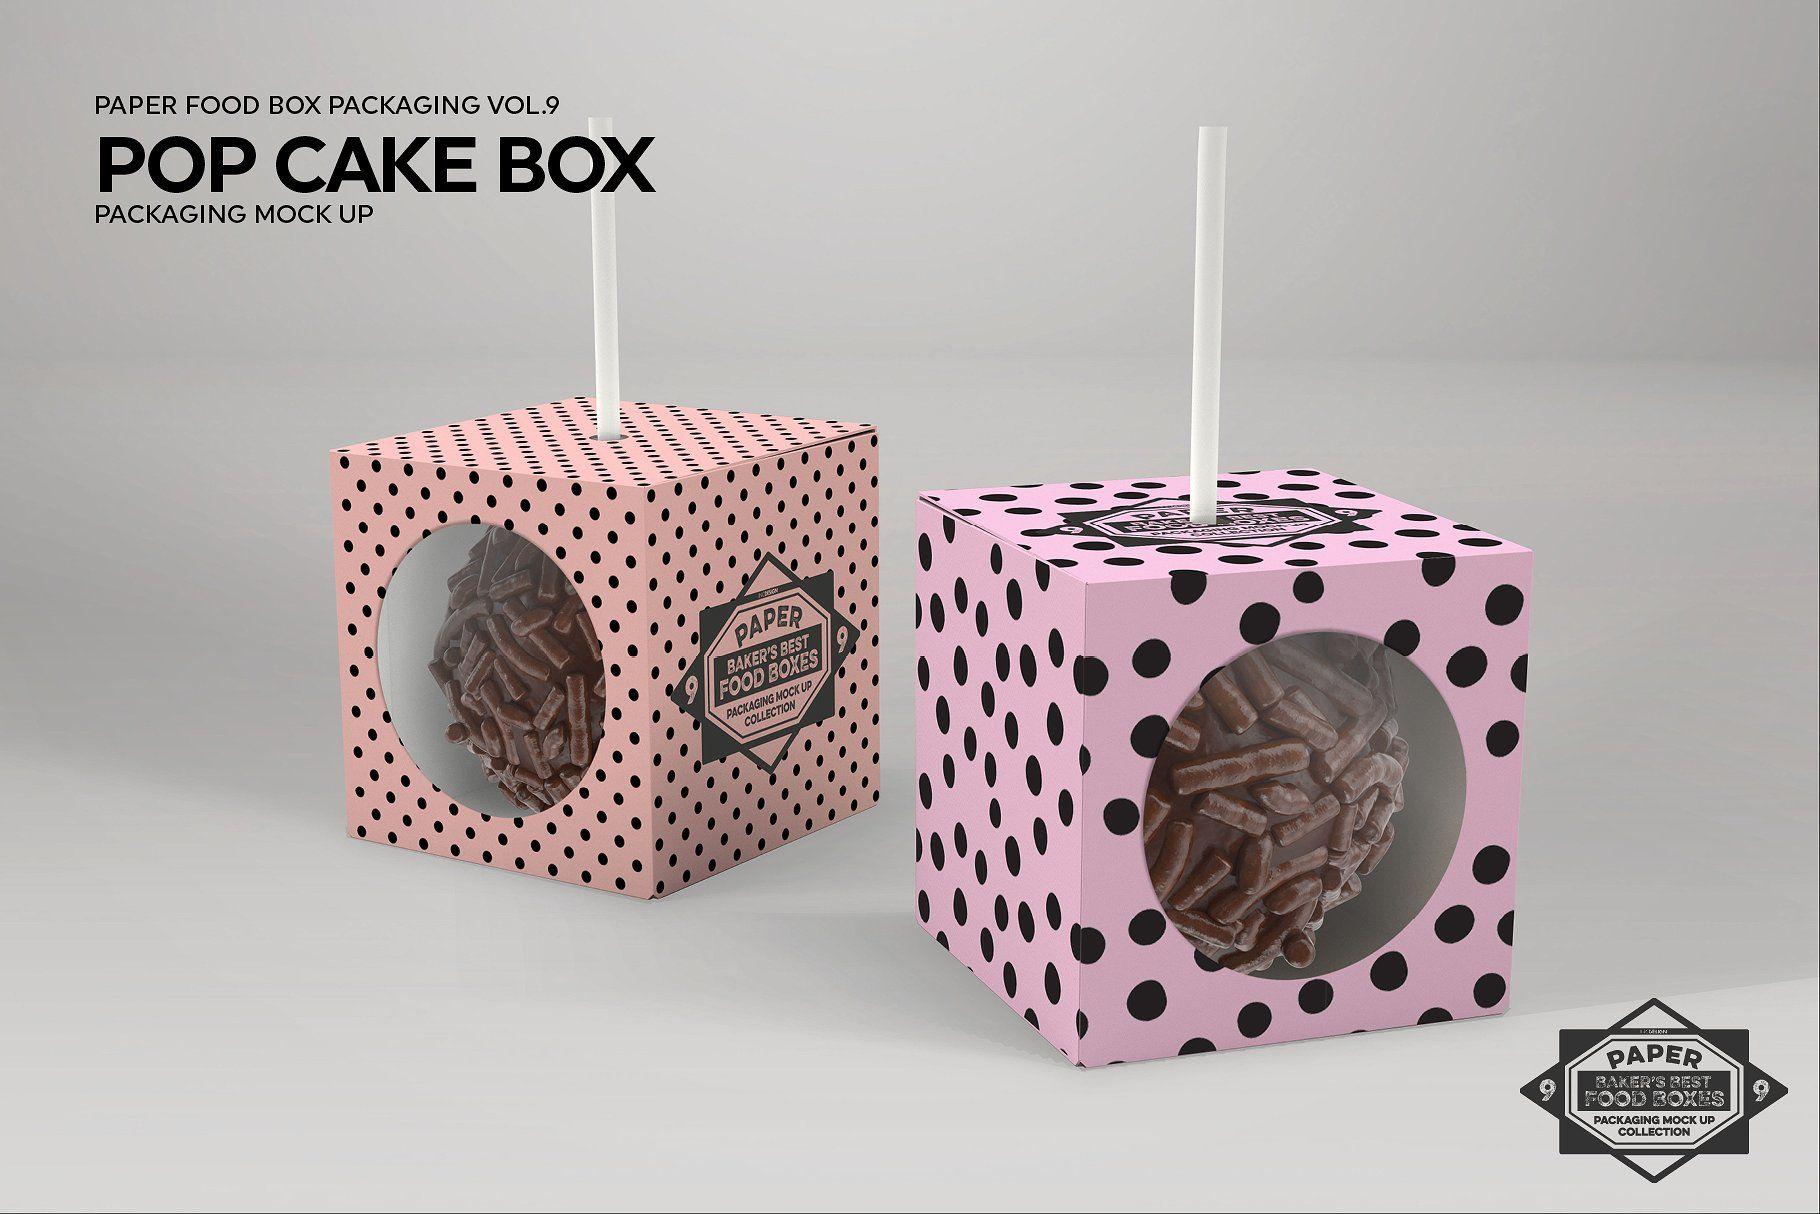 Download Cake Pop Box Packaging Mockup Cake Pop Boxes Food Box Packaging Box Packaging